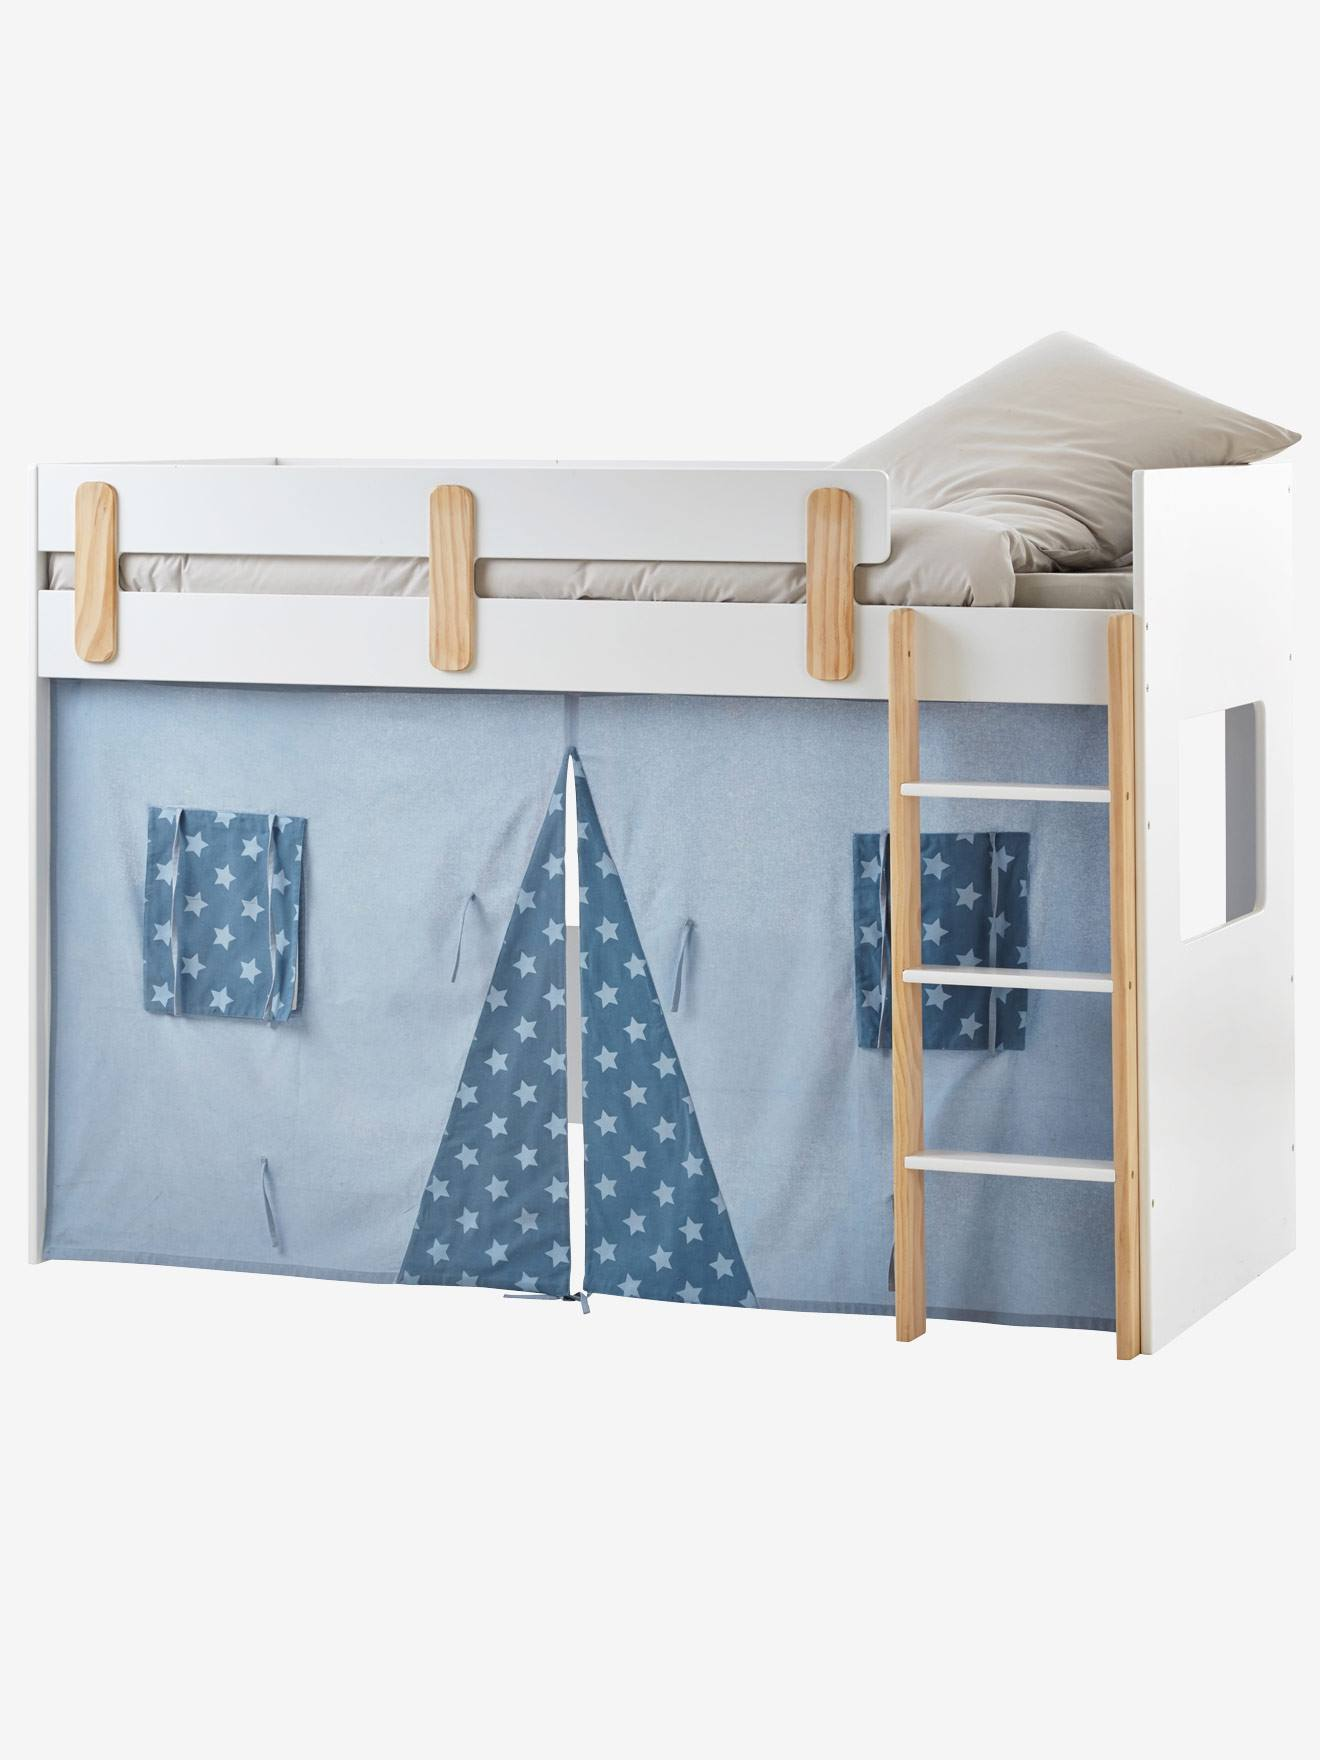 rideau vert baudet excellent rangement et occultant pois with rideau vert baudet rideau motifs. Black Bedroom Furniture Sets. Home Design Ideas